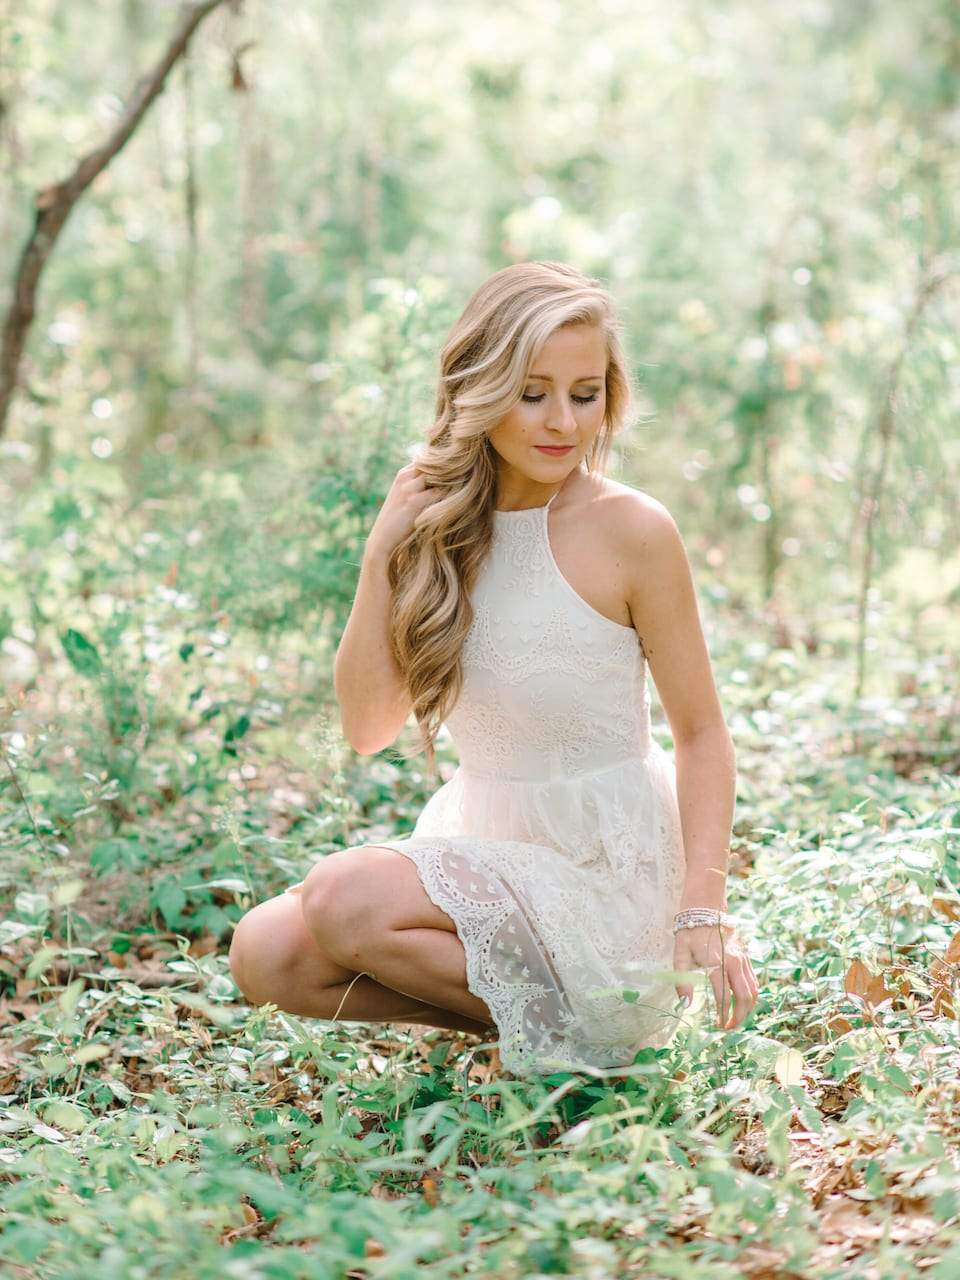 6 Stunning White Dress Ideas For Charleston Senior Photography Session